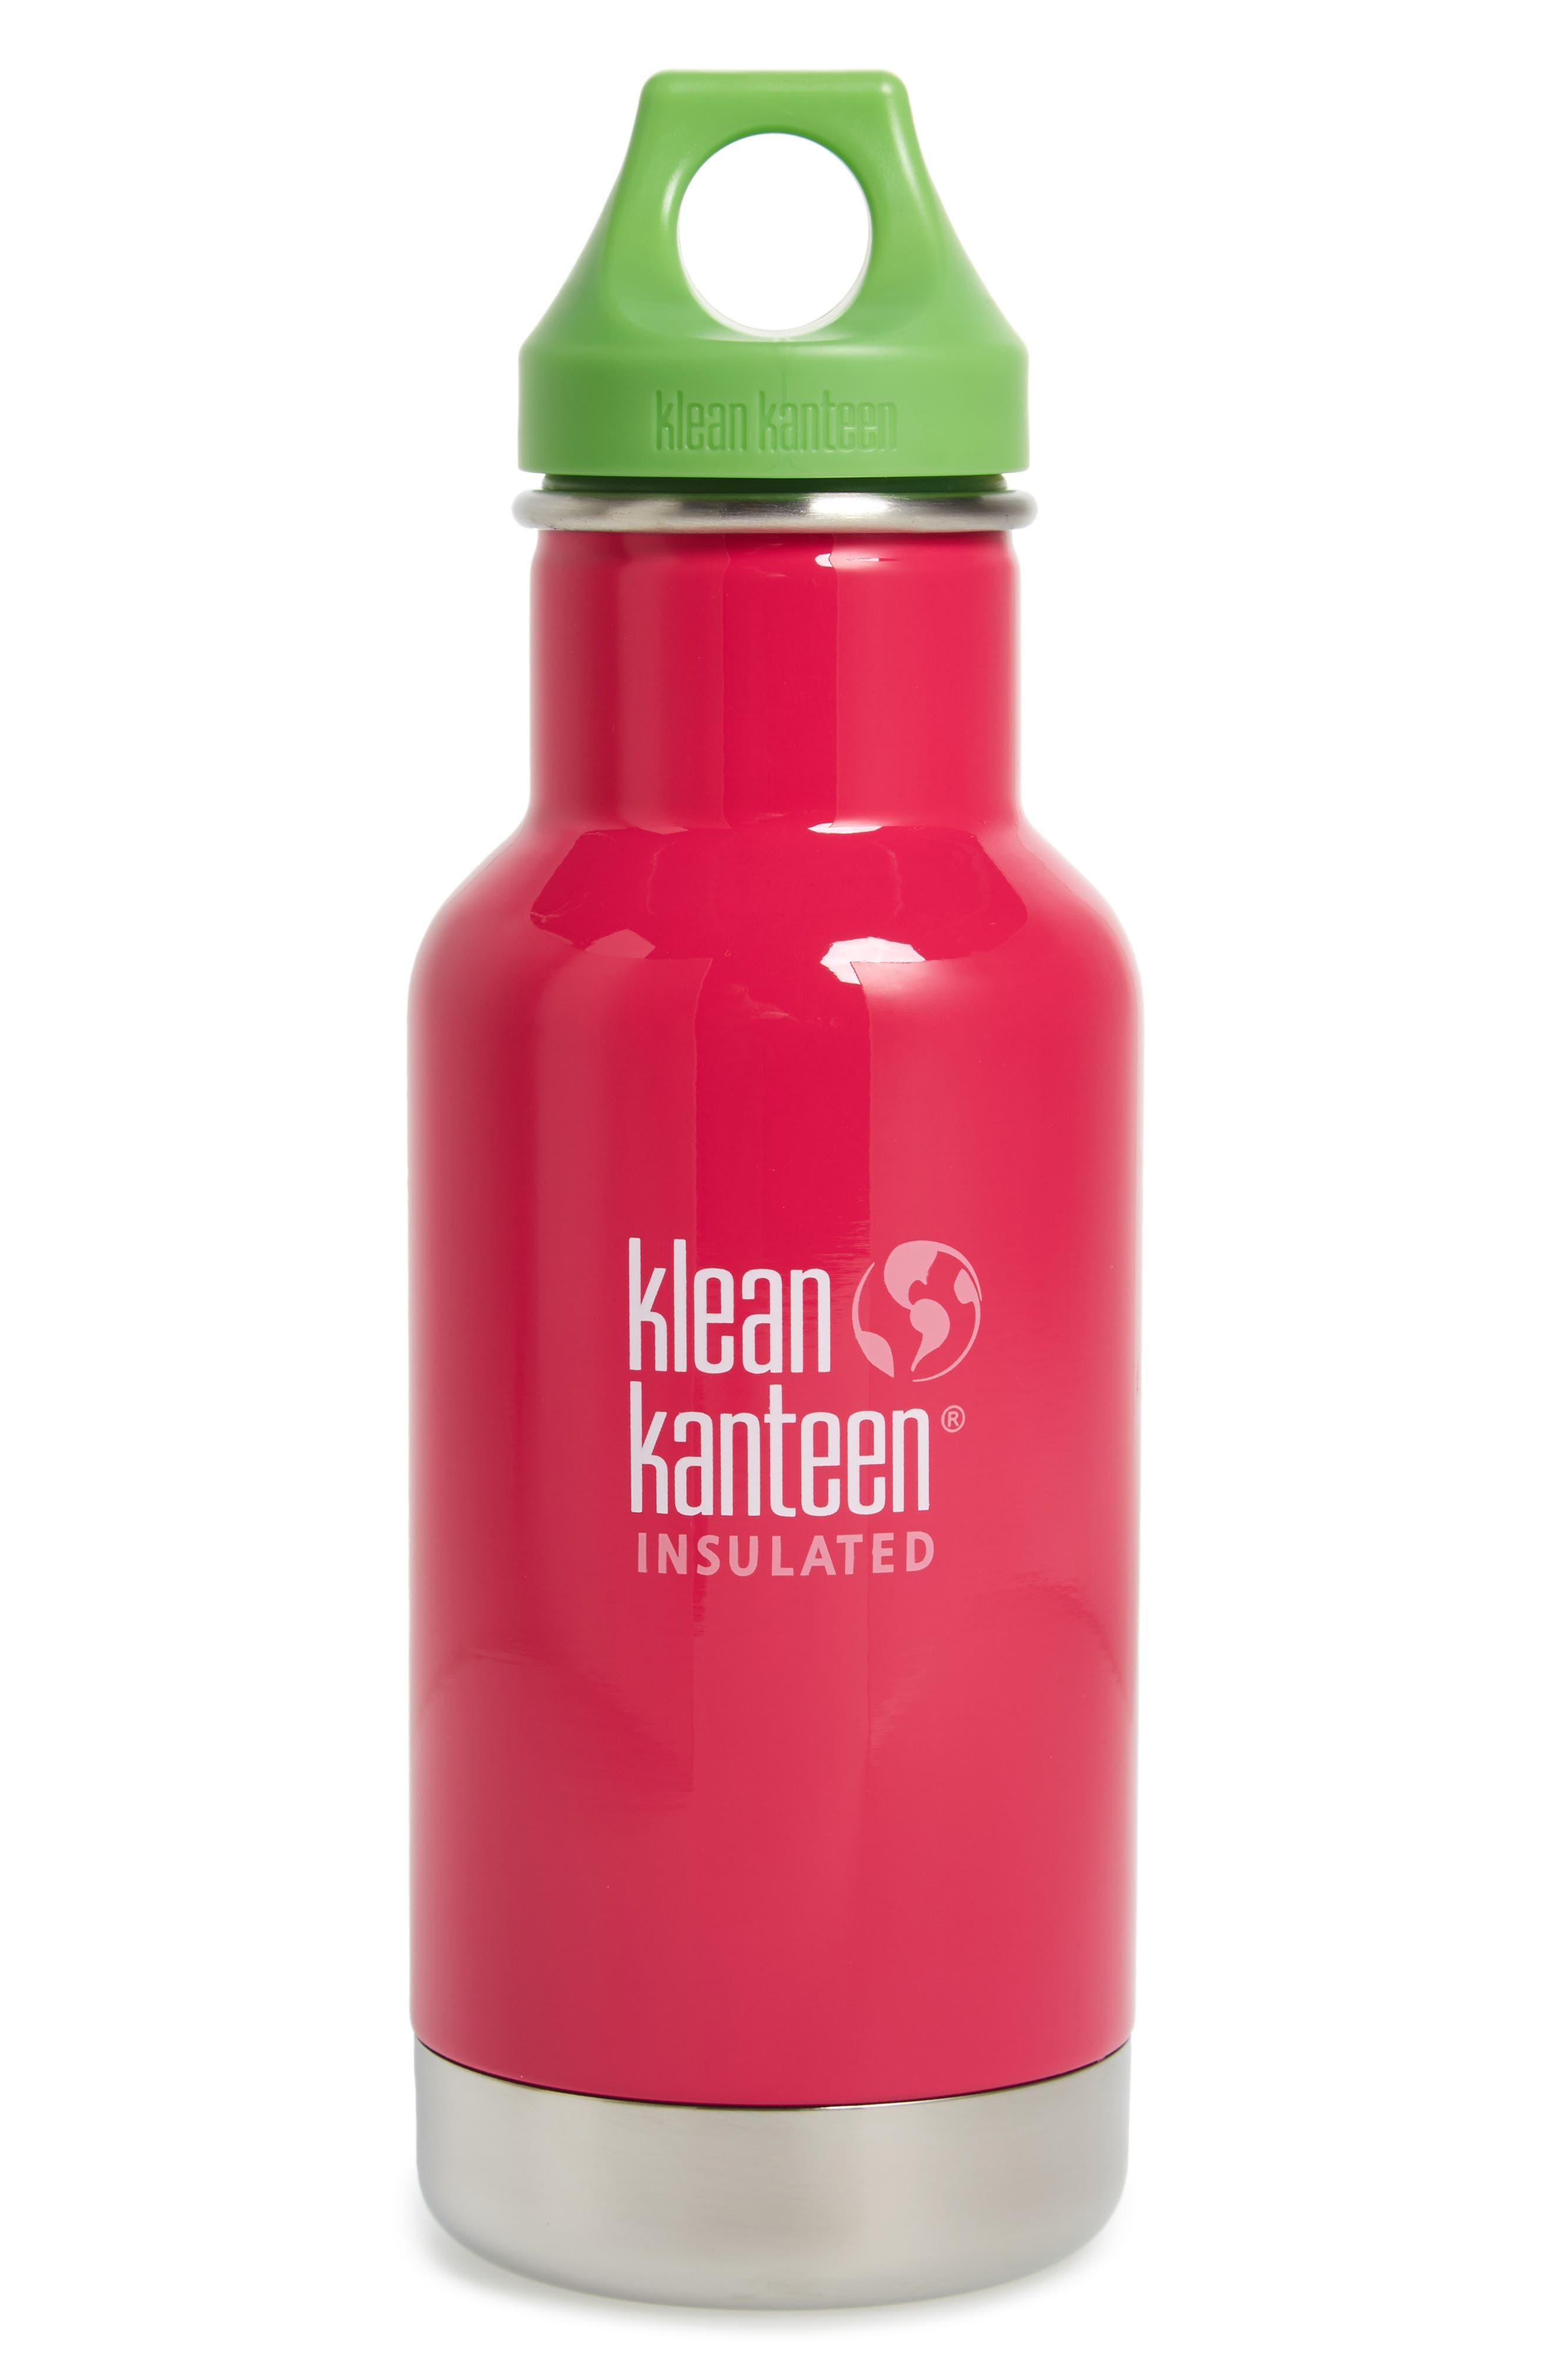 Alternate Image 1 Selected - Klean Kanteen Kid Kanteen Vacuum Insulated Bottle (12 oz.)